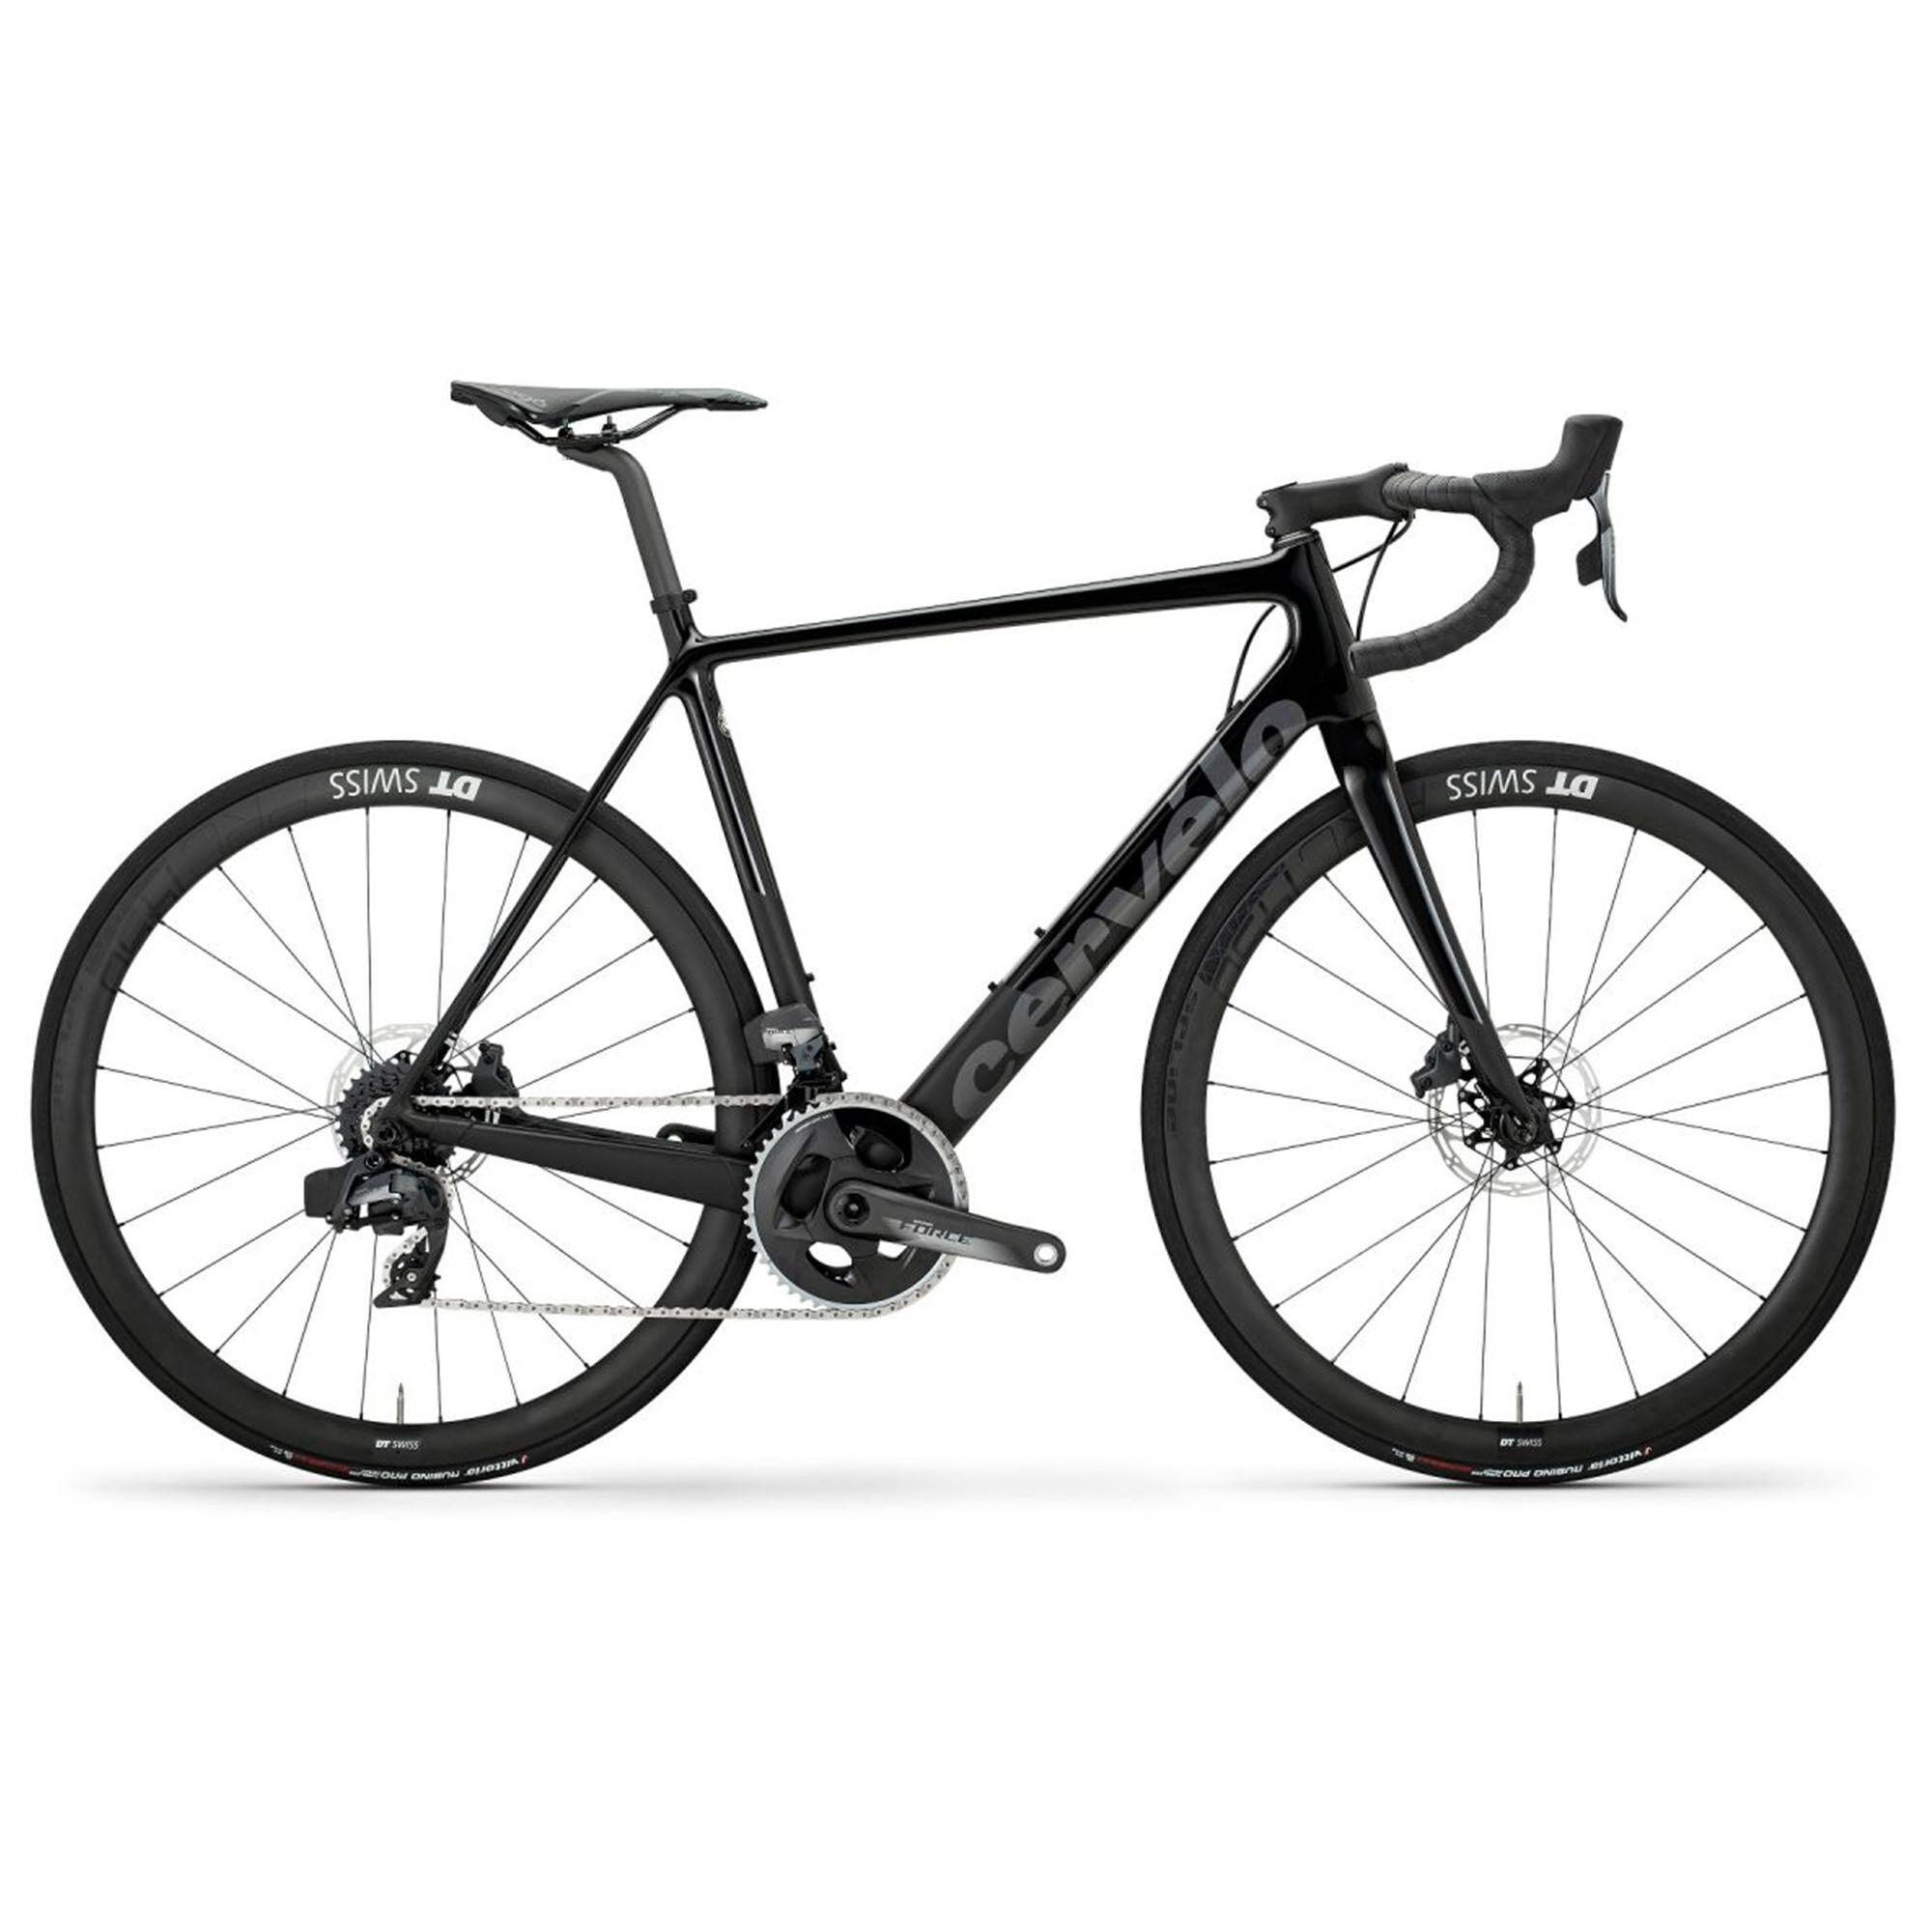 Cervelo Men's R-Series Force AXS Classic Road Bike '20  - Black/Dark Grey - Size: 54